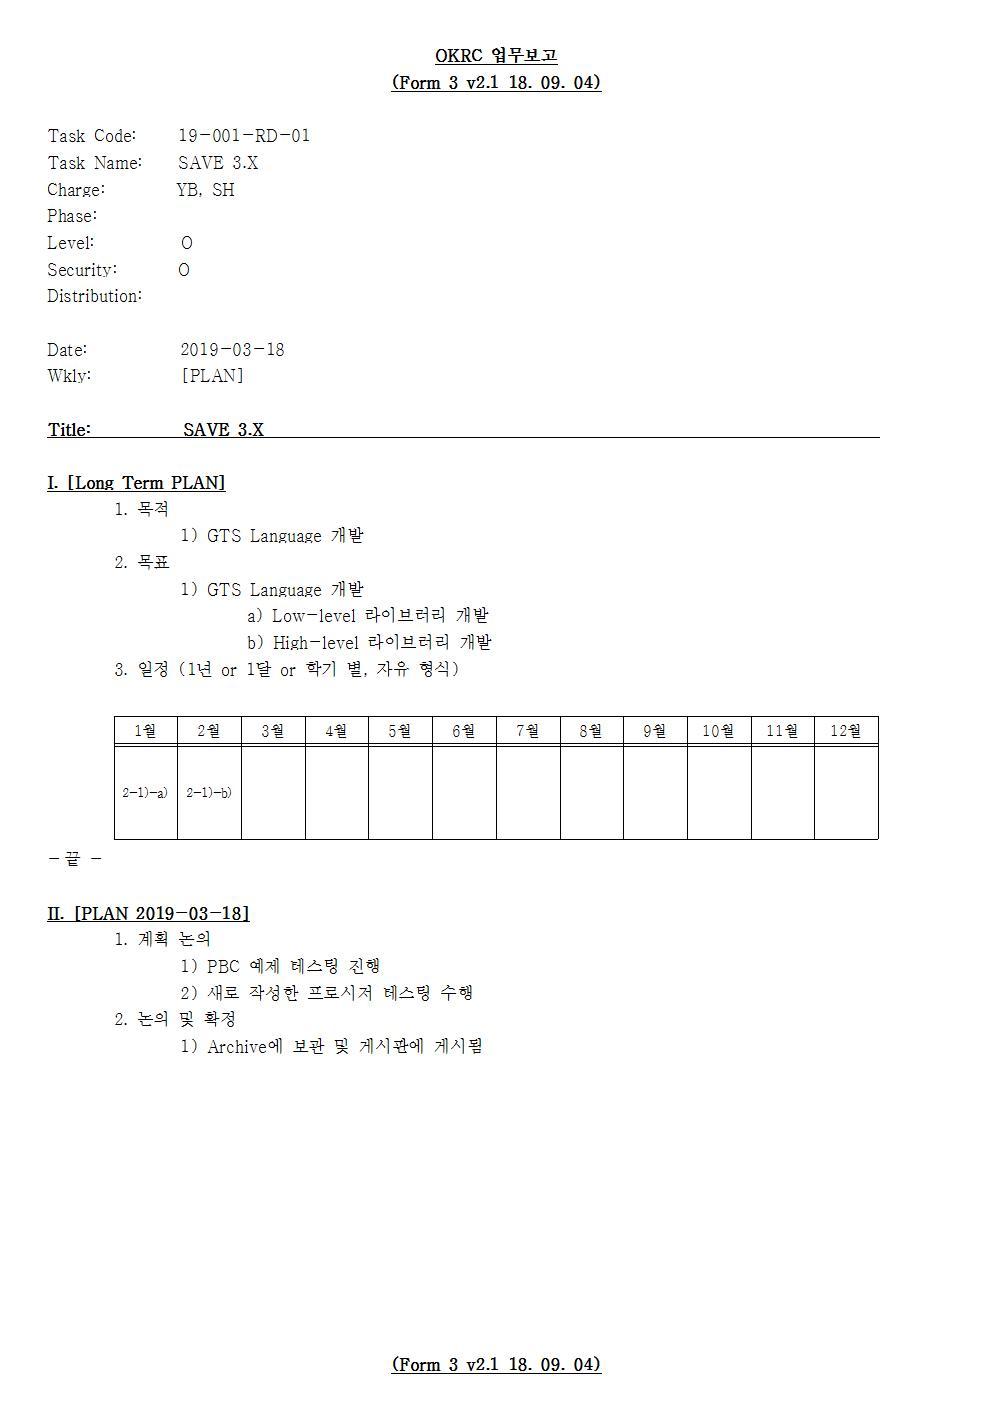 D-[19-001-RD-01]-[SAVE 3.X]-[2019-03-18][SH]001.jpg